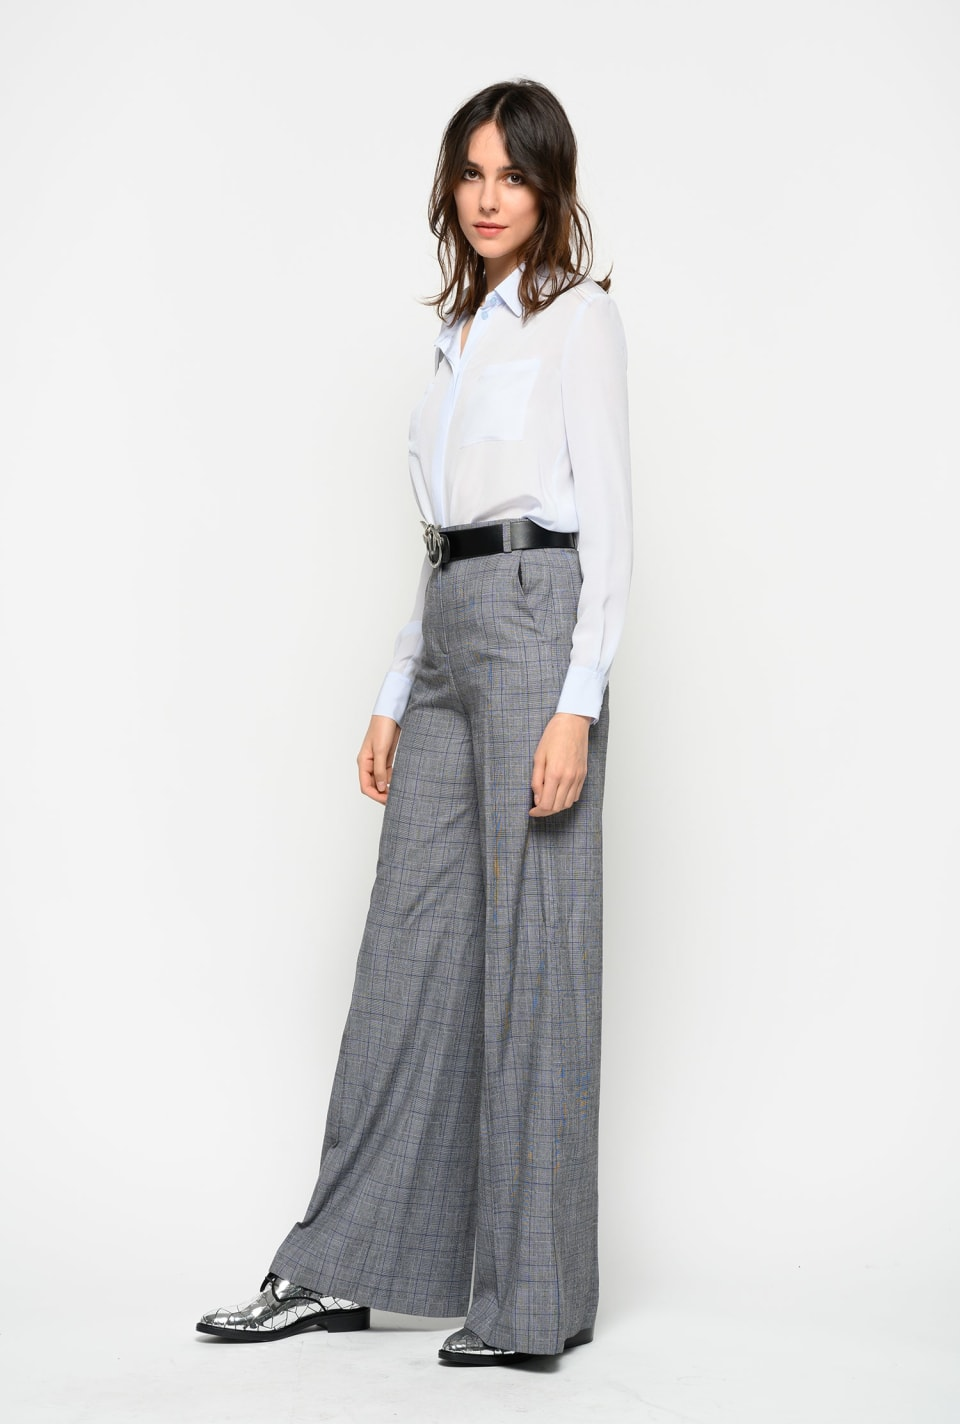 Pantaloni palazzo in tela di lana